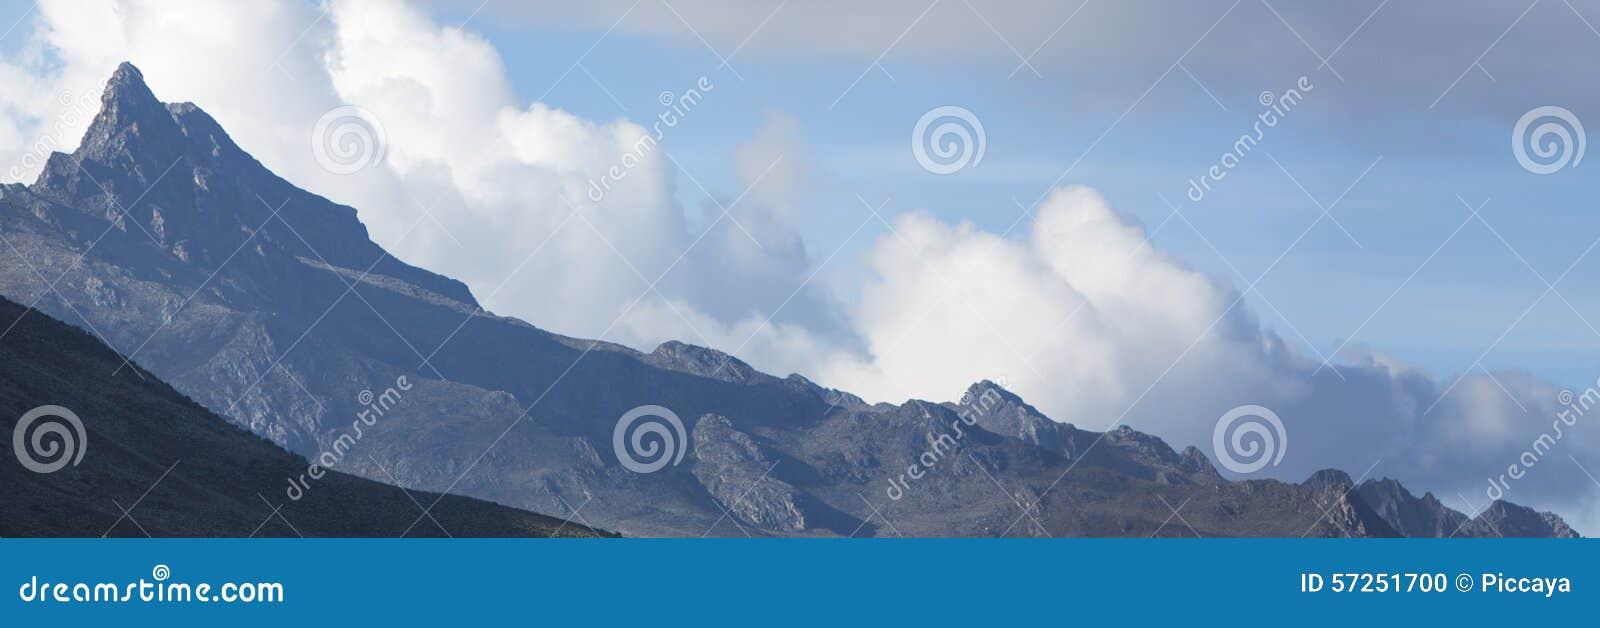 Panorama Der Anden Berge Staat Von Merida Venezuela Stockfoto Bild